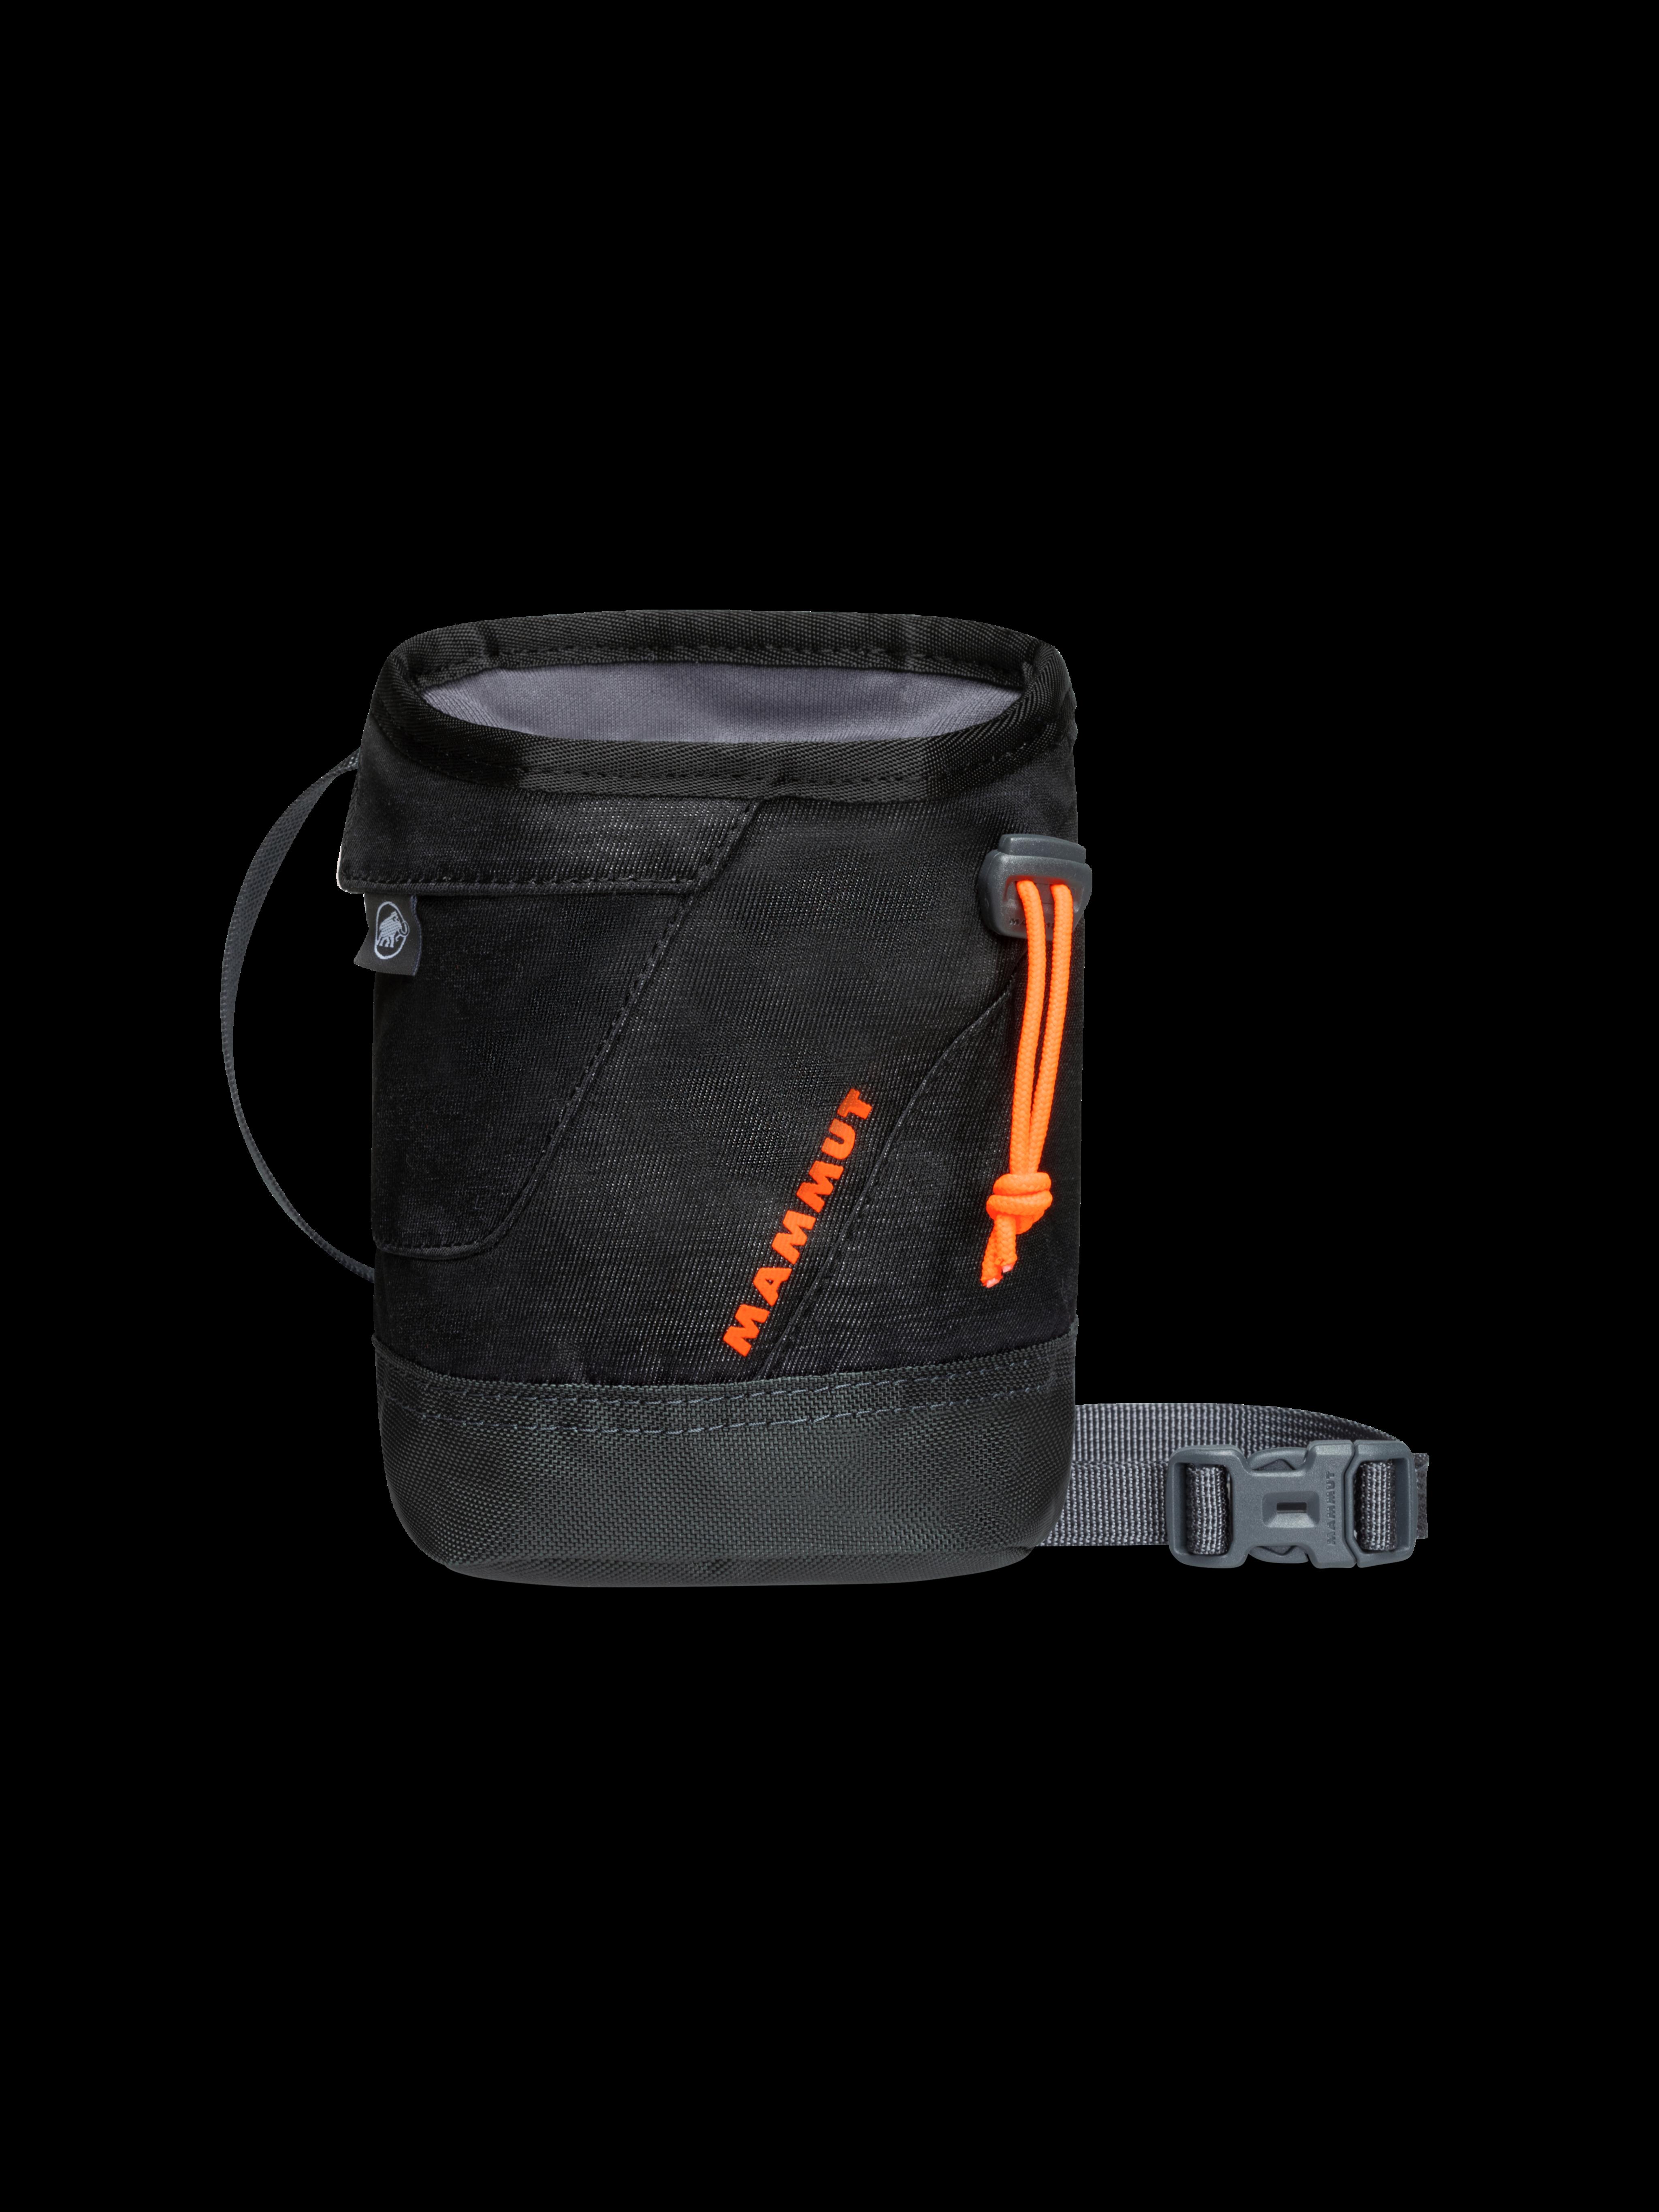 Ophir Chalk Bag product image